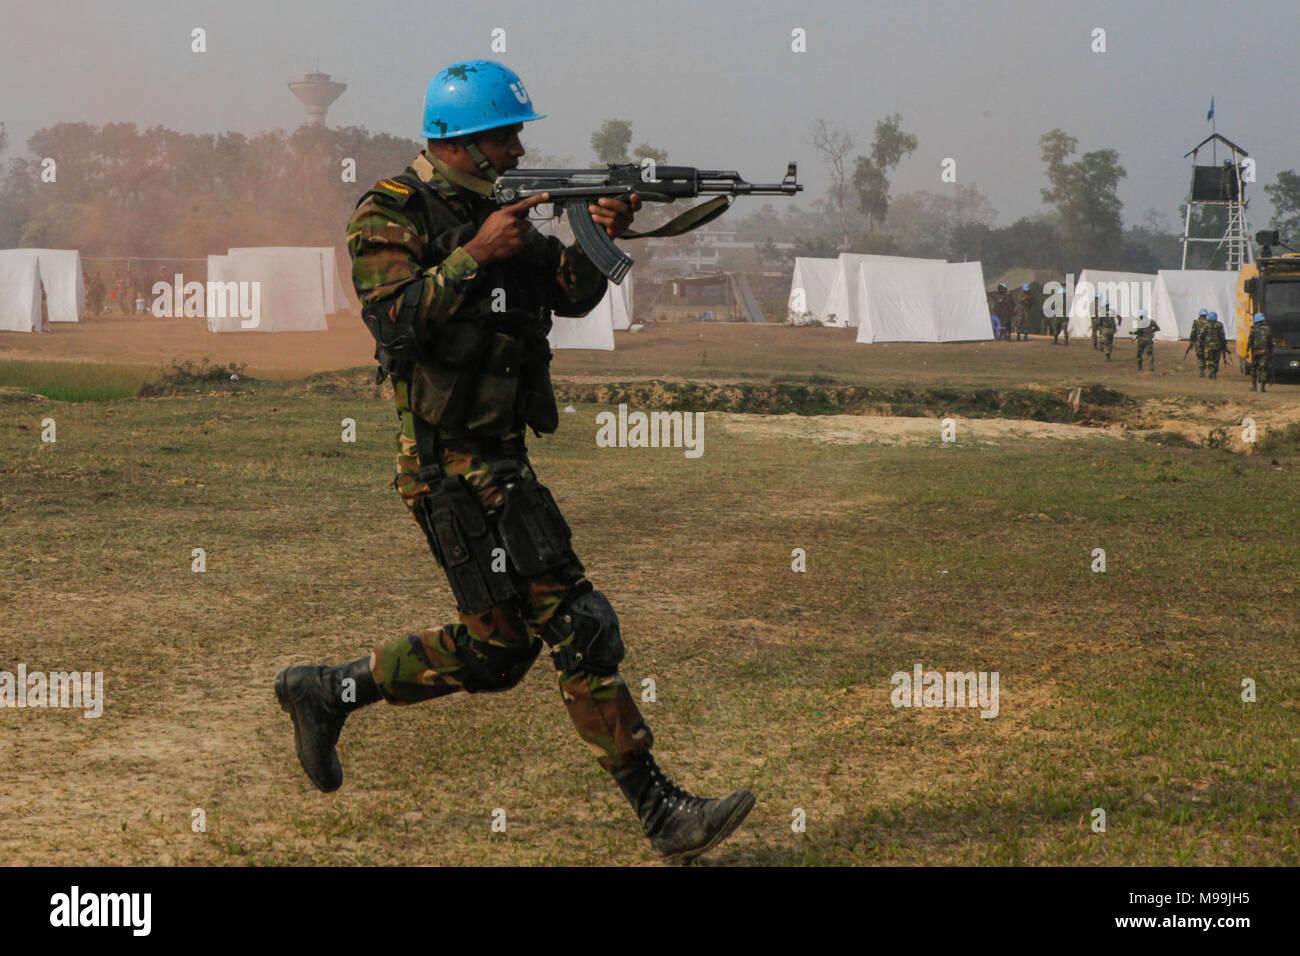 29ab4667574b A Bangladesh Army soldier of the Para-Commando Brigade runs to secure a  drop zone